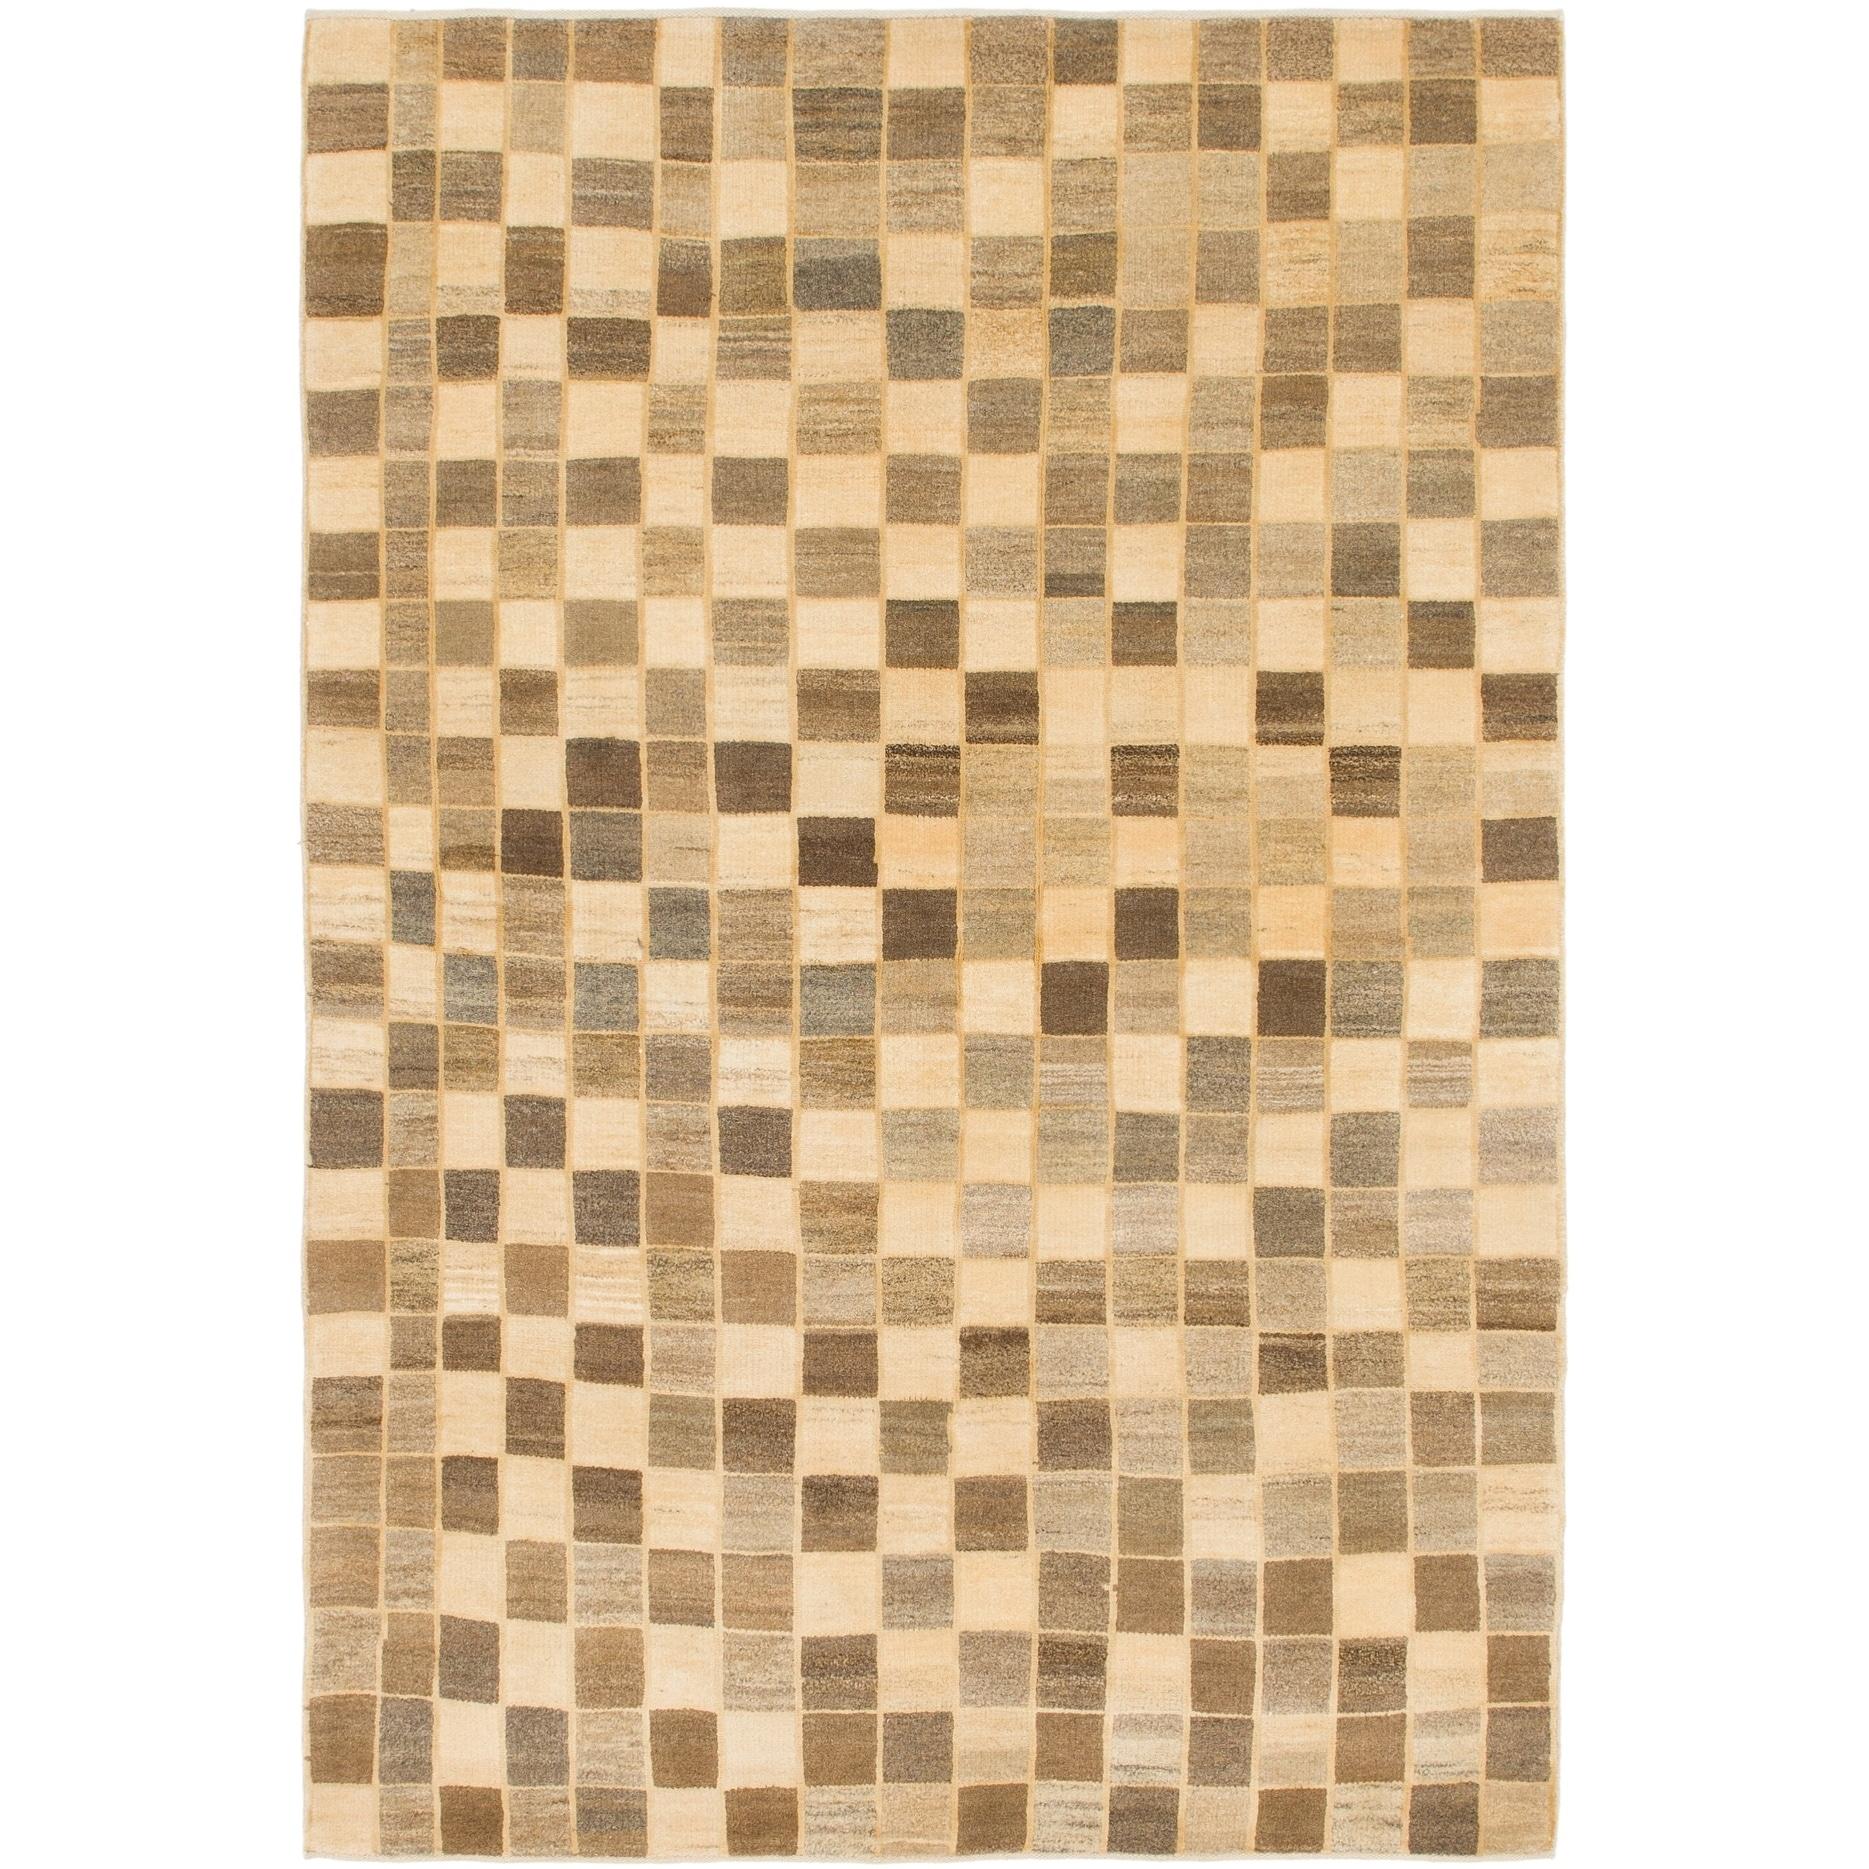 Hand Knotted Kashkuli Gabbeh Wool Area Rug - 5 4 x 8 2 (Multi - 5 4 x 8 2)